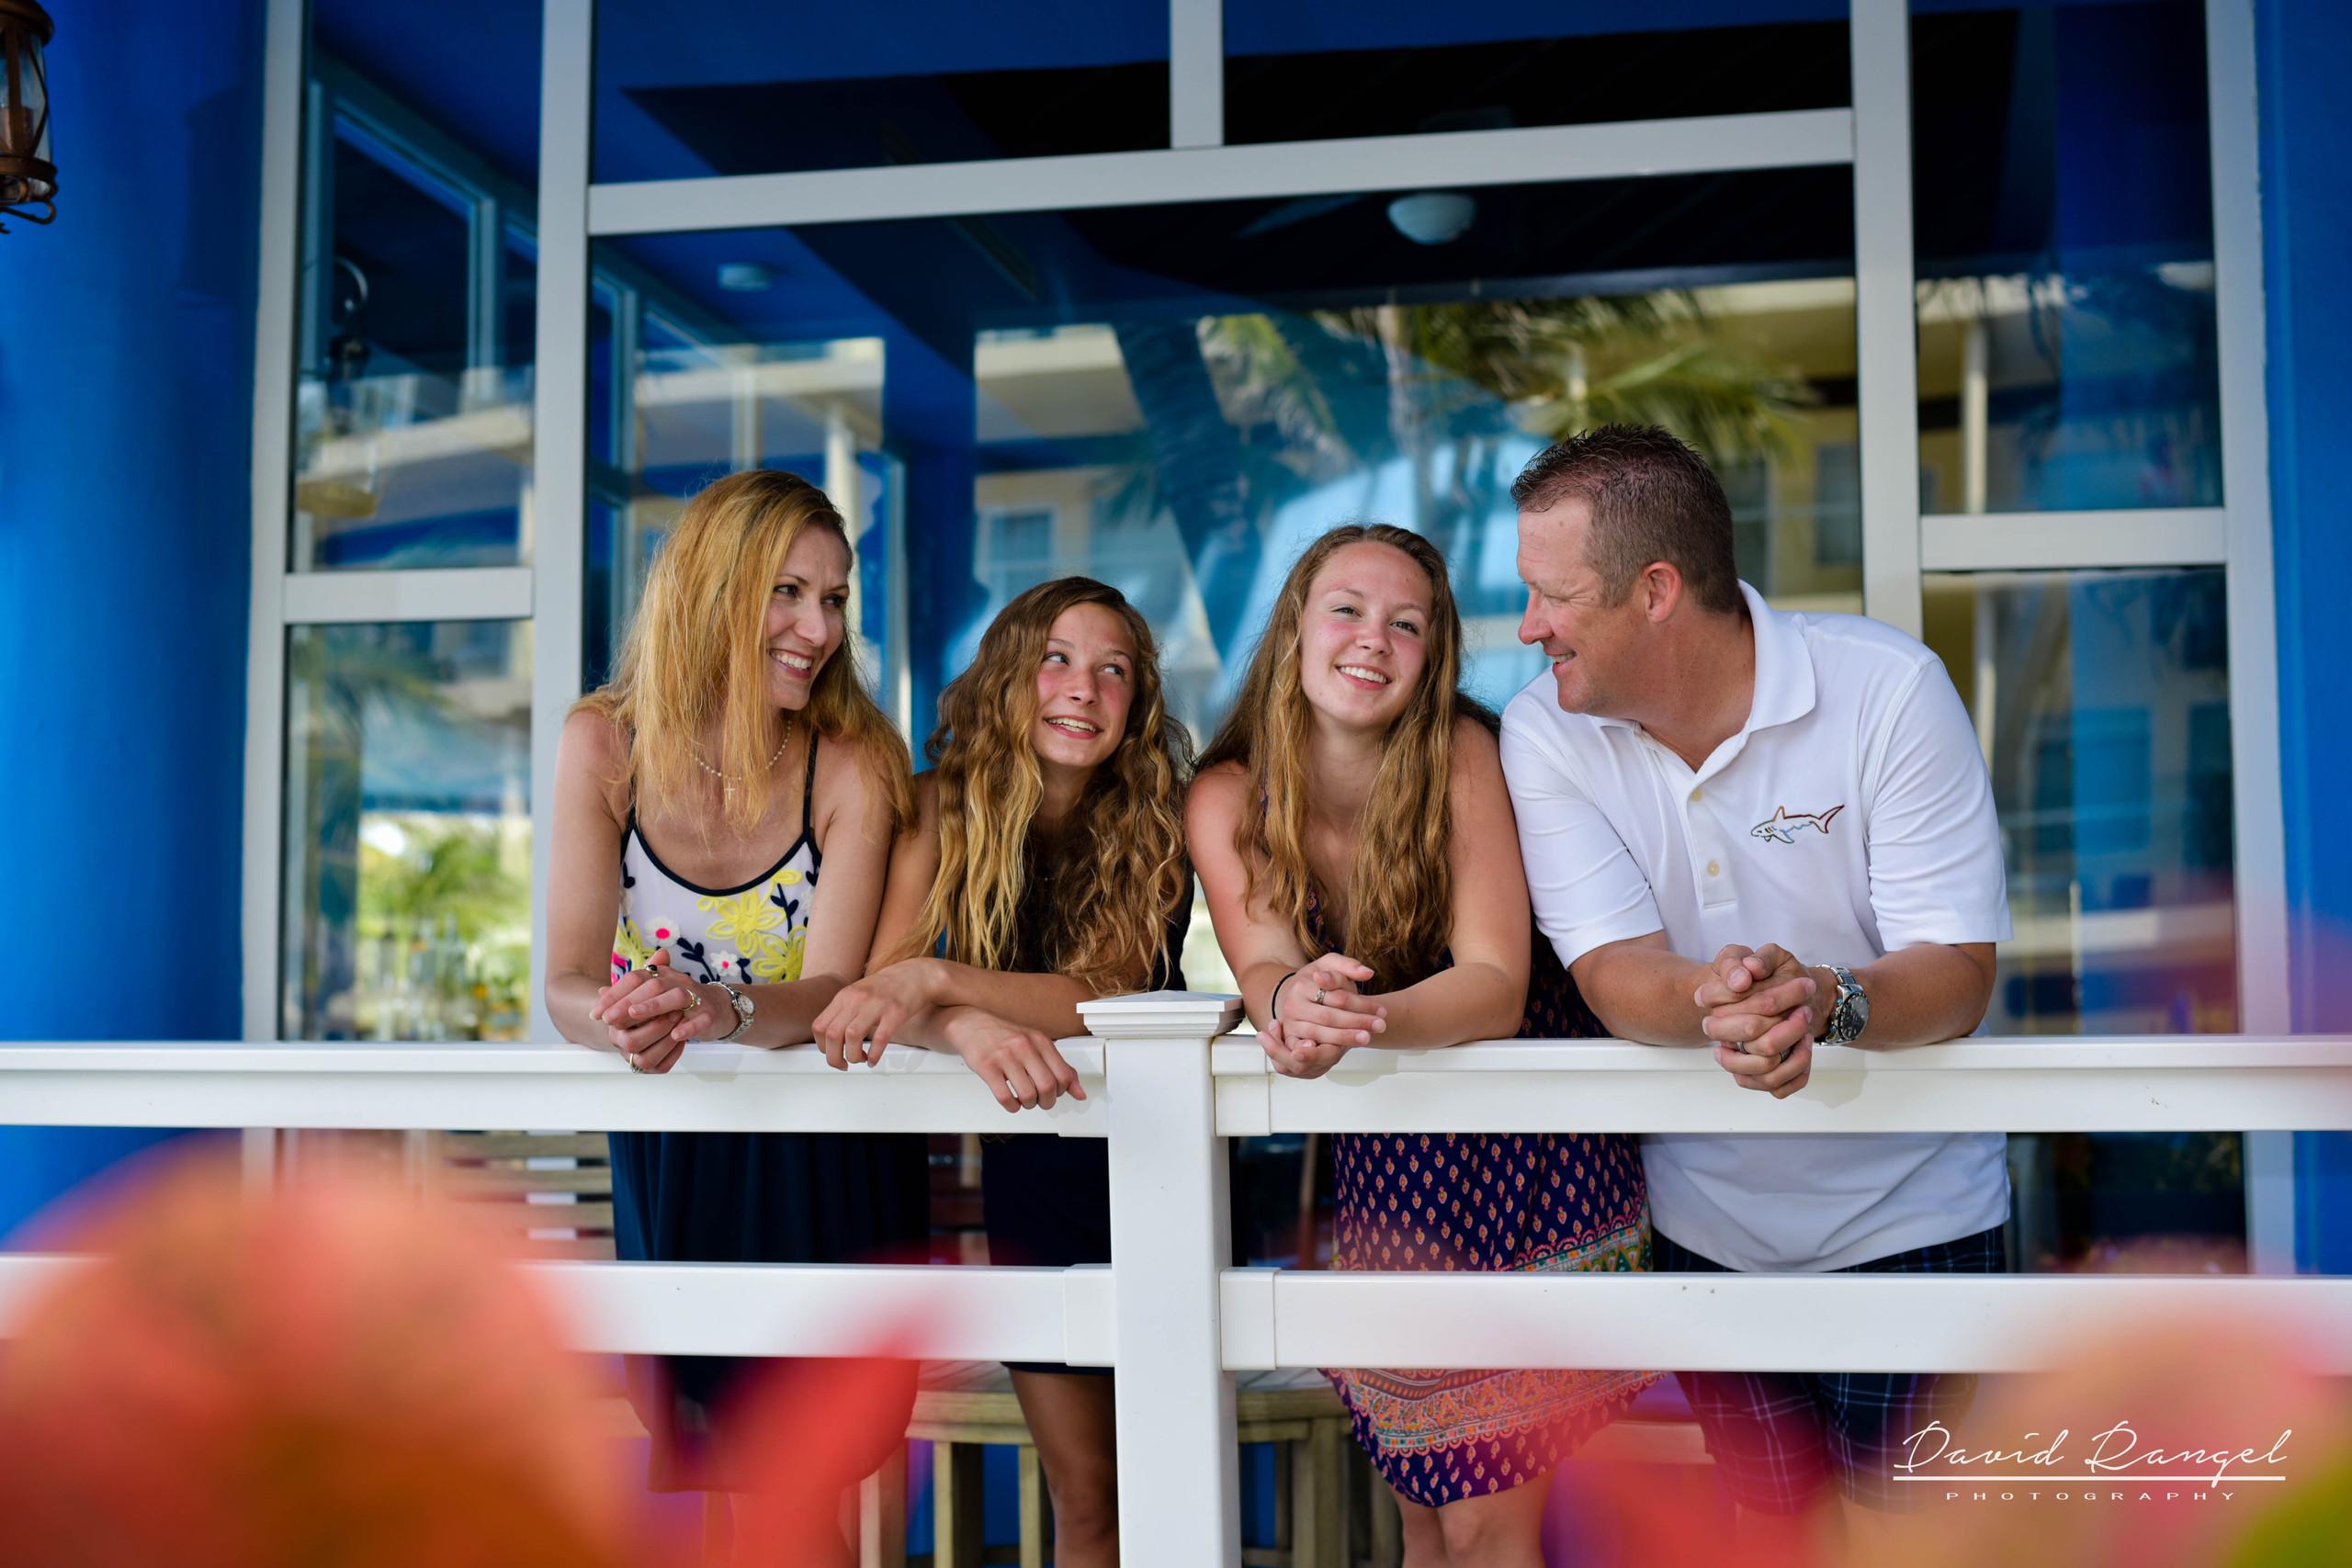 photos+in+cancun